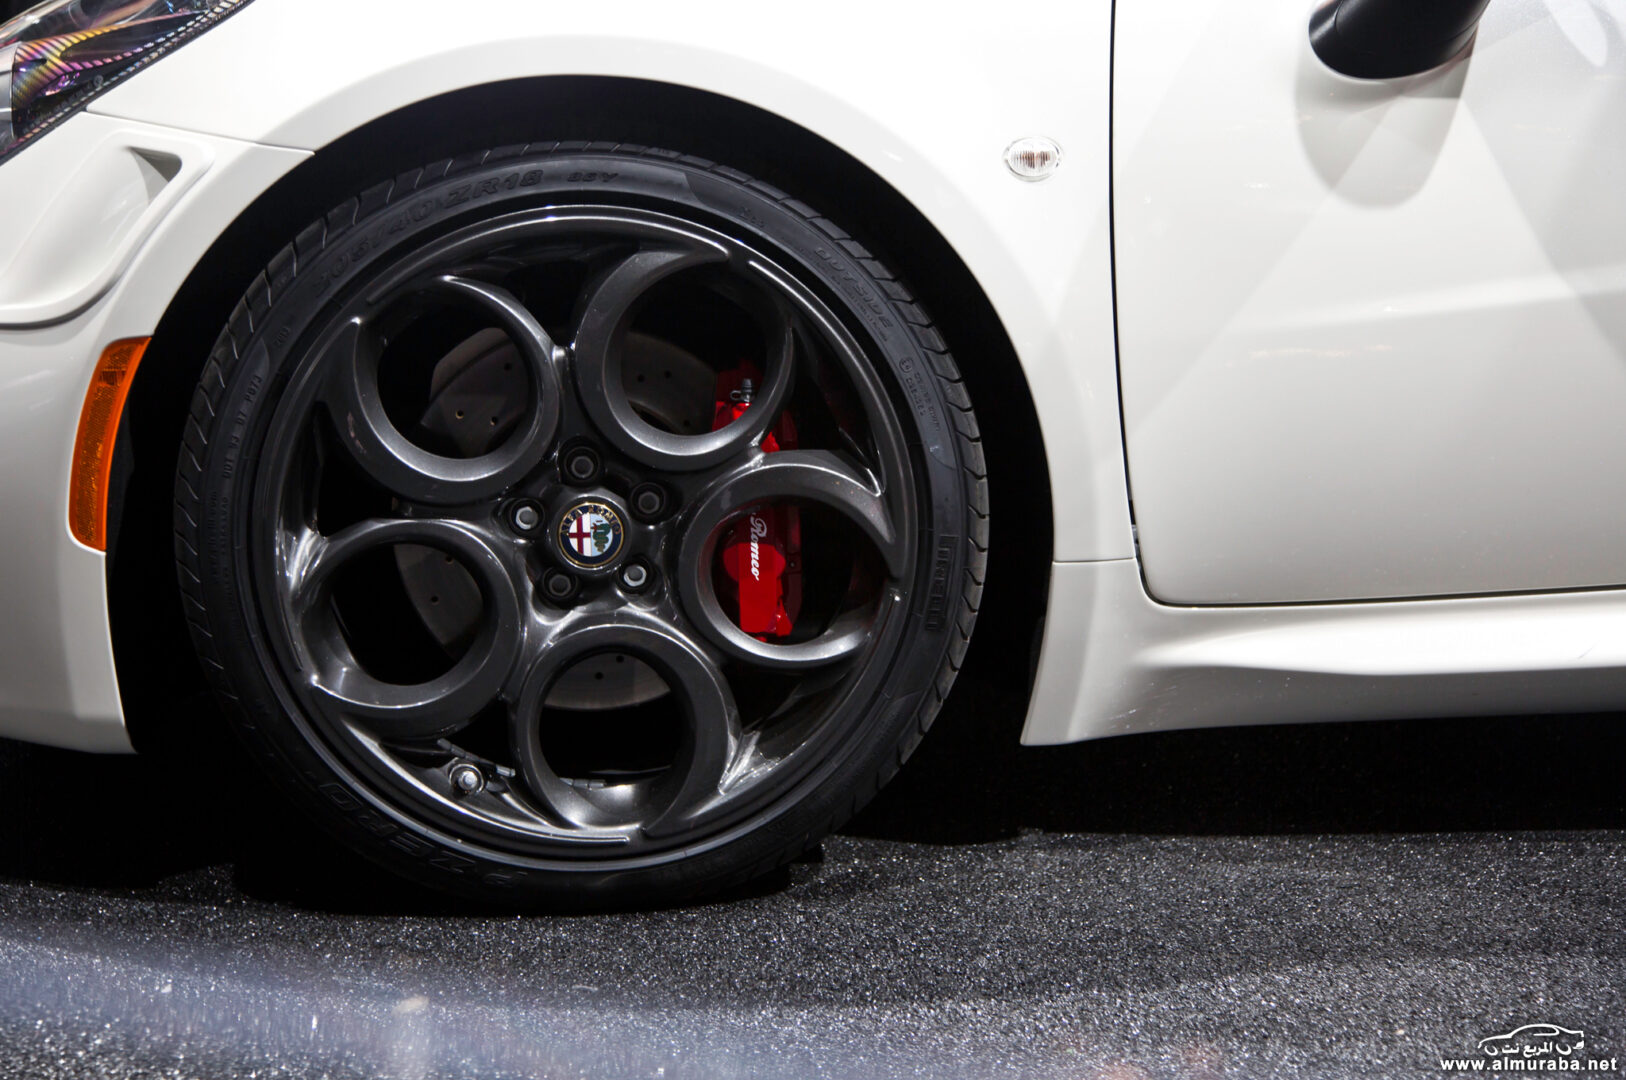 http---image.motortrend.com-f-wot-1404_2015_alfa_romeo_4c_launch_edition_arrives_this_june-72848178-2015-Alfa-Romeo-4C-Launch-Edition-wheels